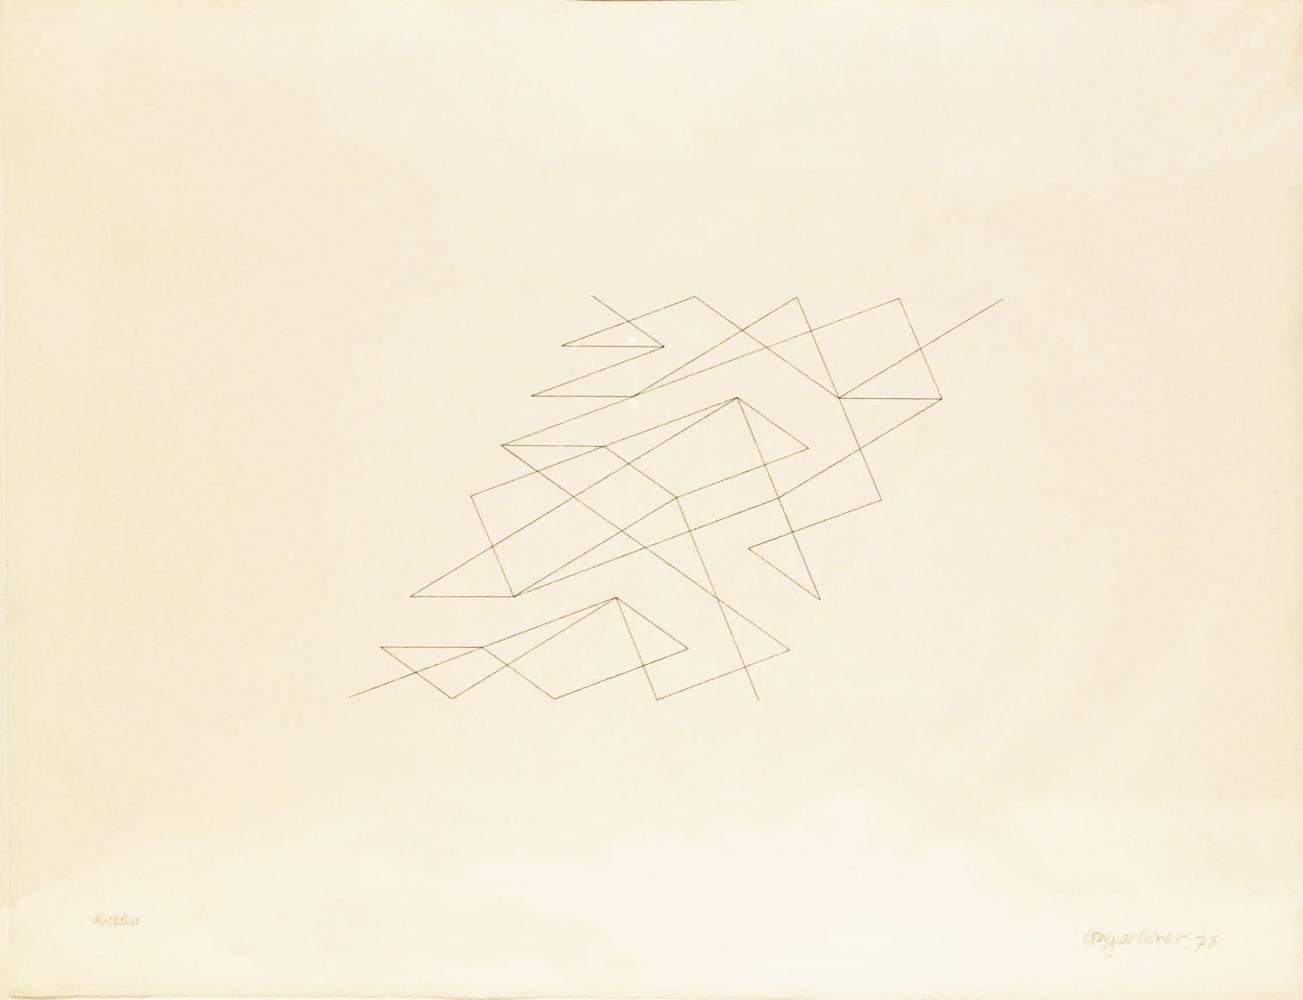 Guy de Cointet  Restless, 1978